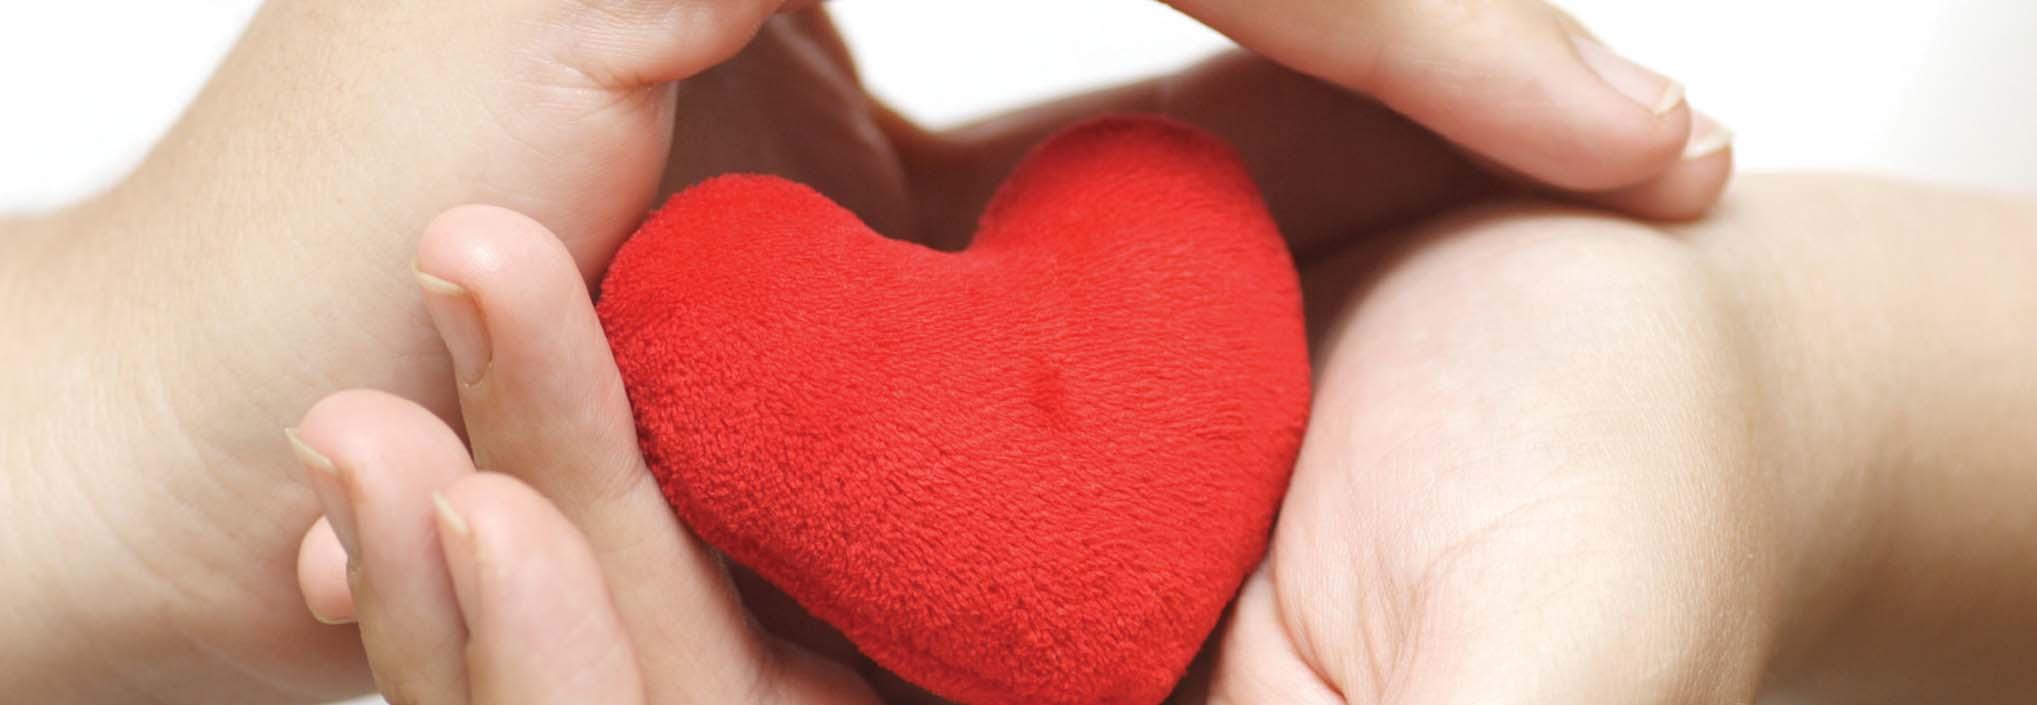 Heart Disease Screening - event details